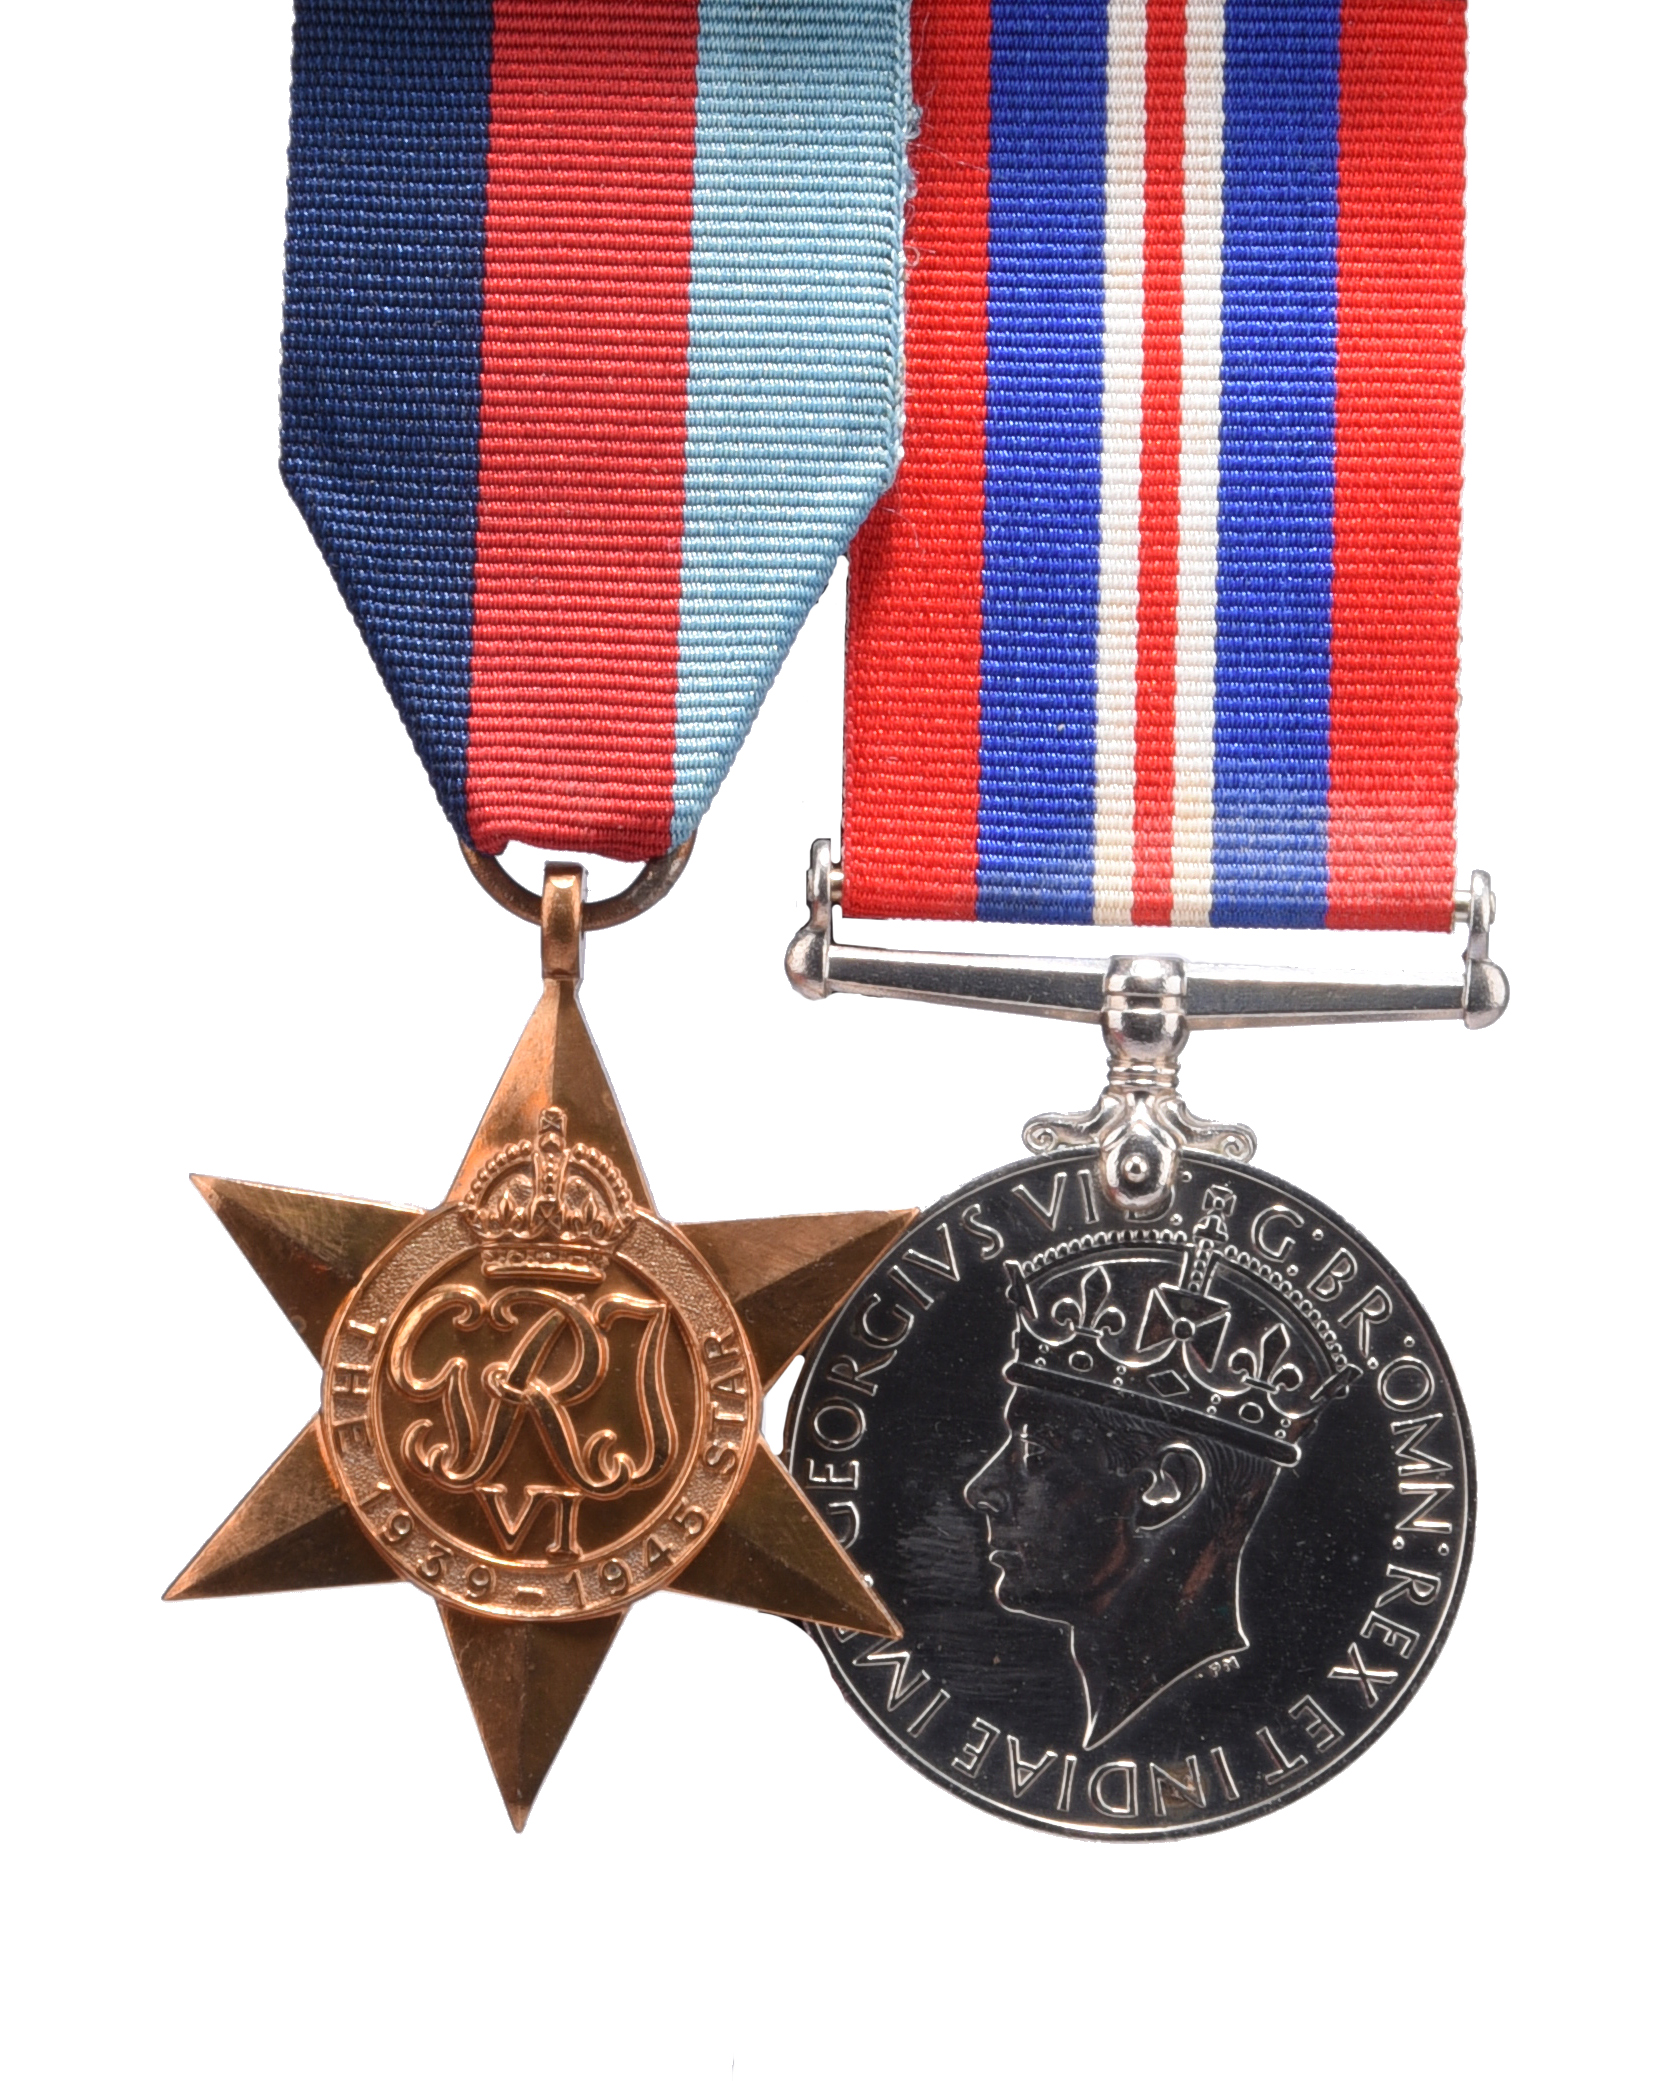 Two medals attributable to Cadet David Arthur Edward Stewart-Cox, Royal Navy, who was lost at sea